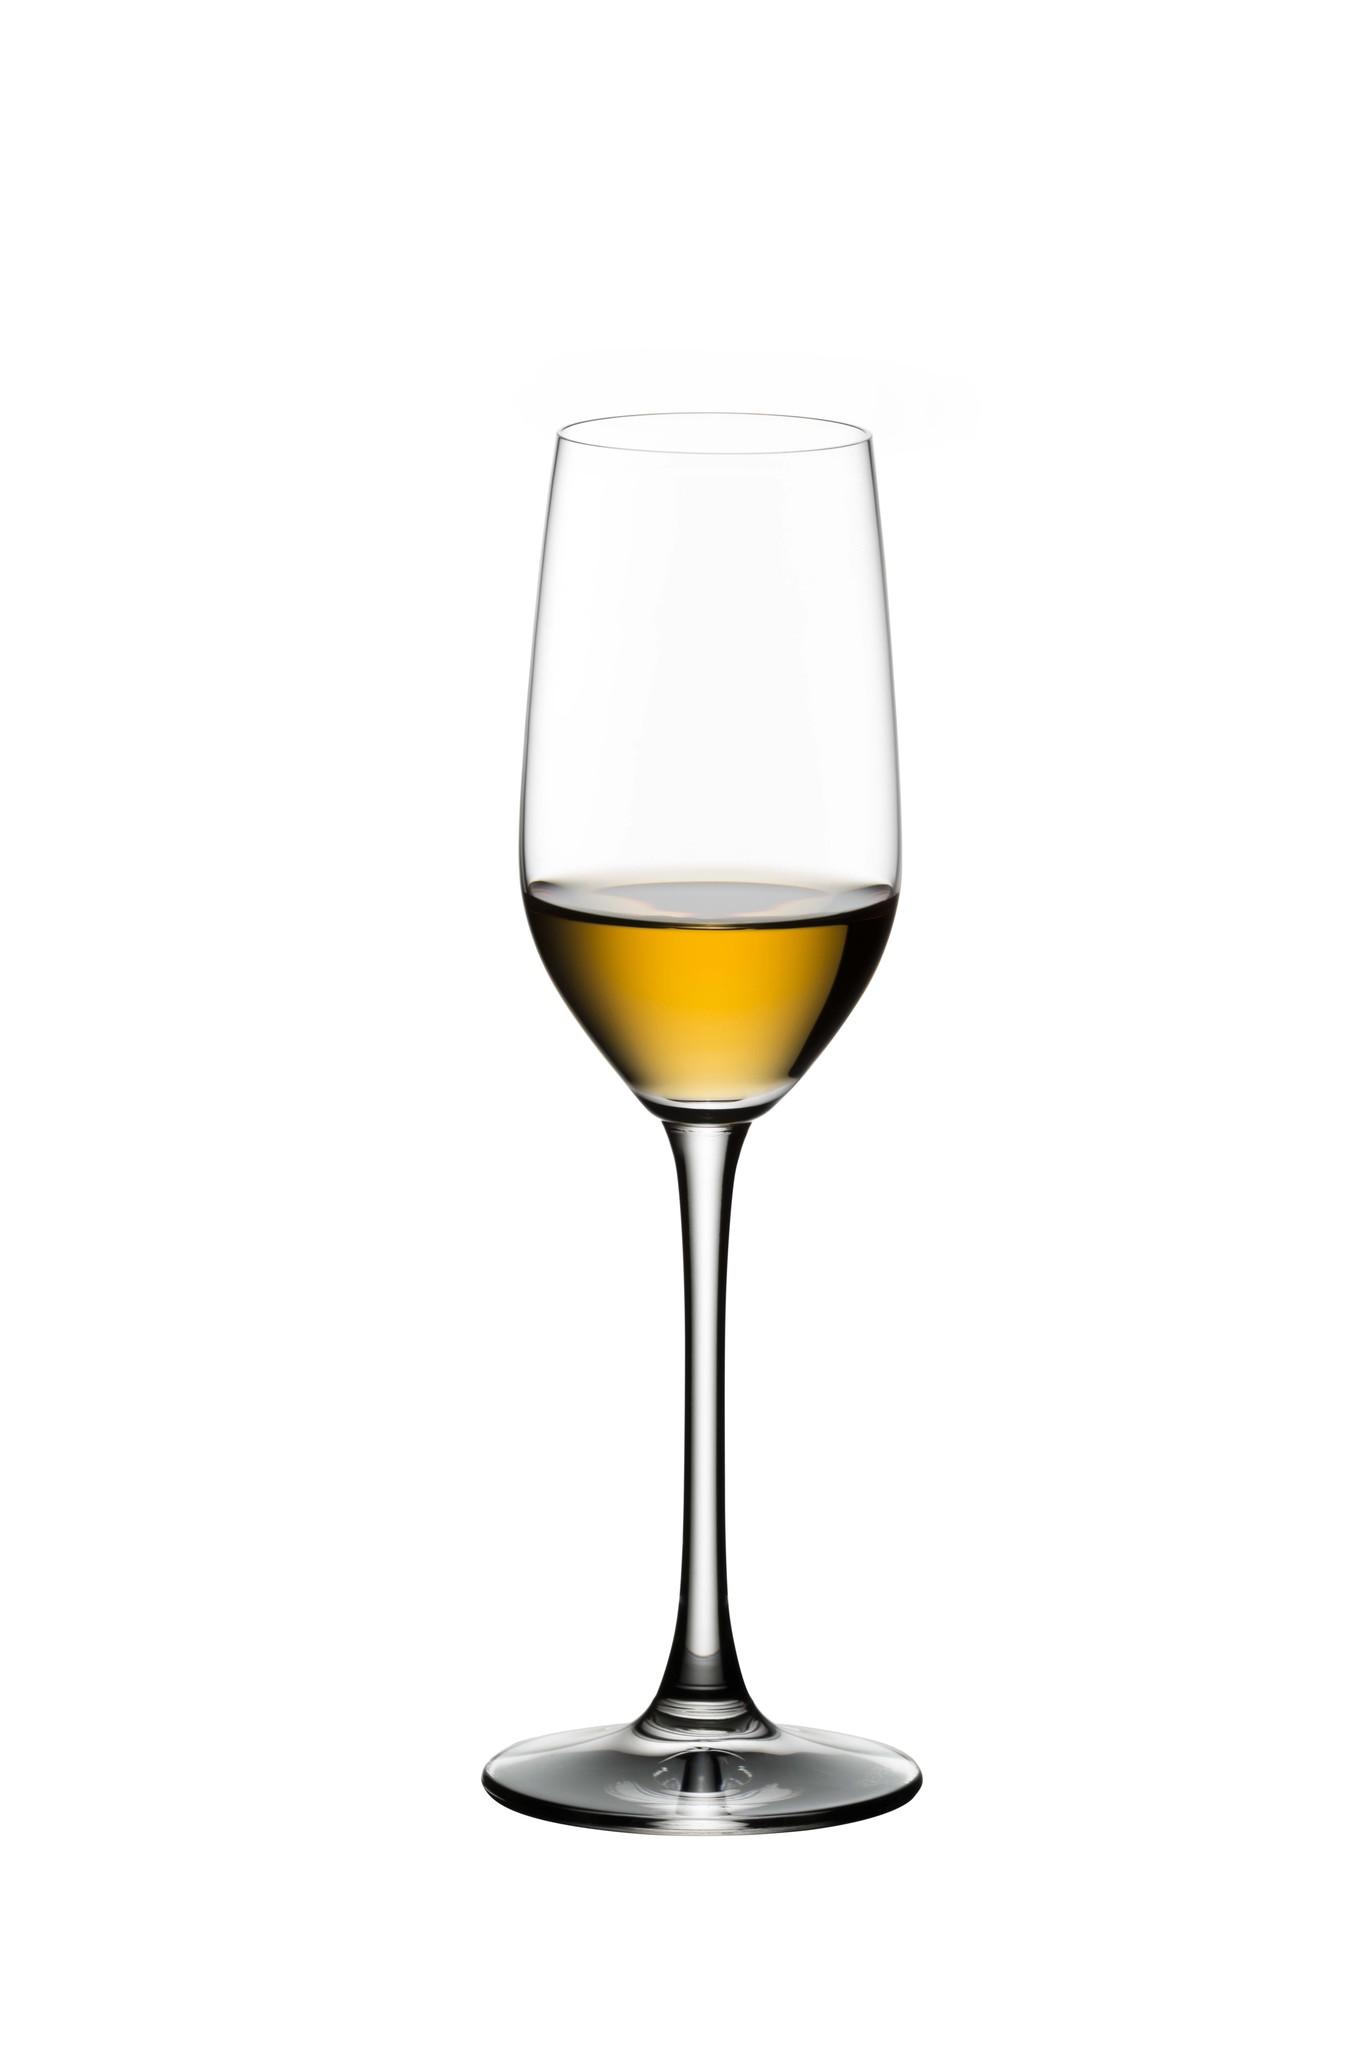 Бокалы Набор бокалов для текилы 2шт 190мл Riedel Ouverture Tequila nabor-bokalov-dlya-tekily-2sht-190ml-riedel-ouverture-tequila-avstriya.jpg